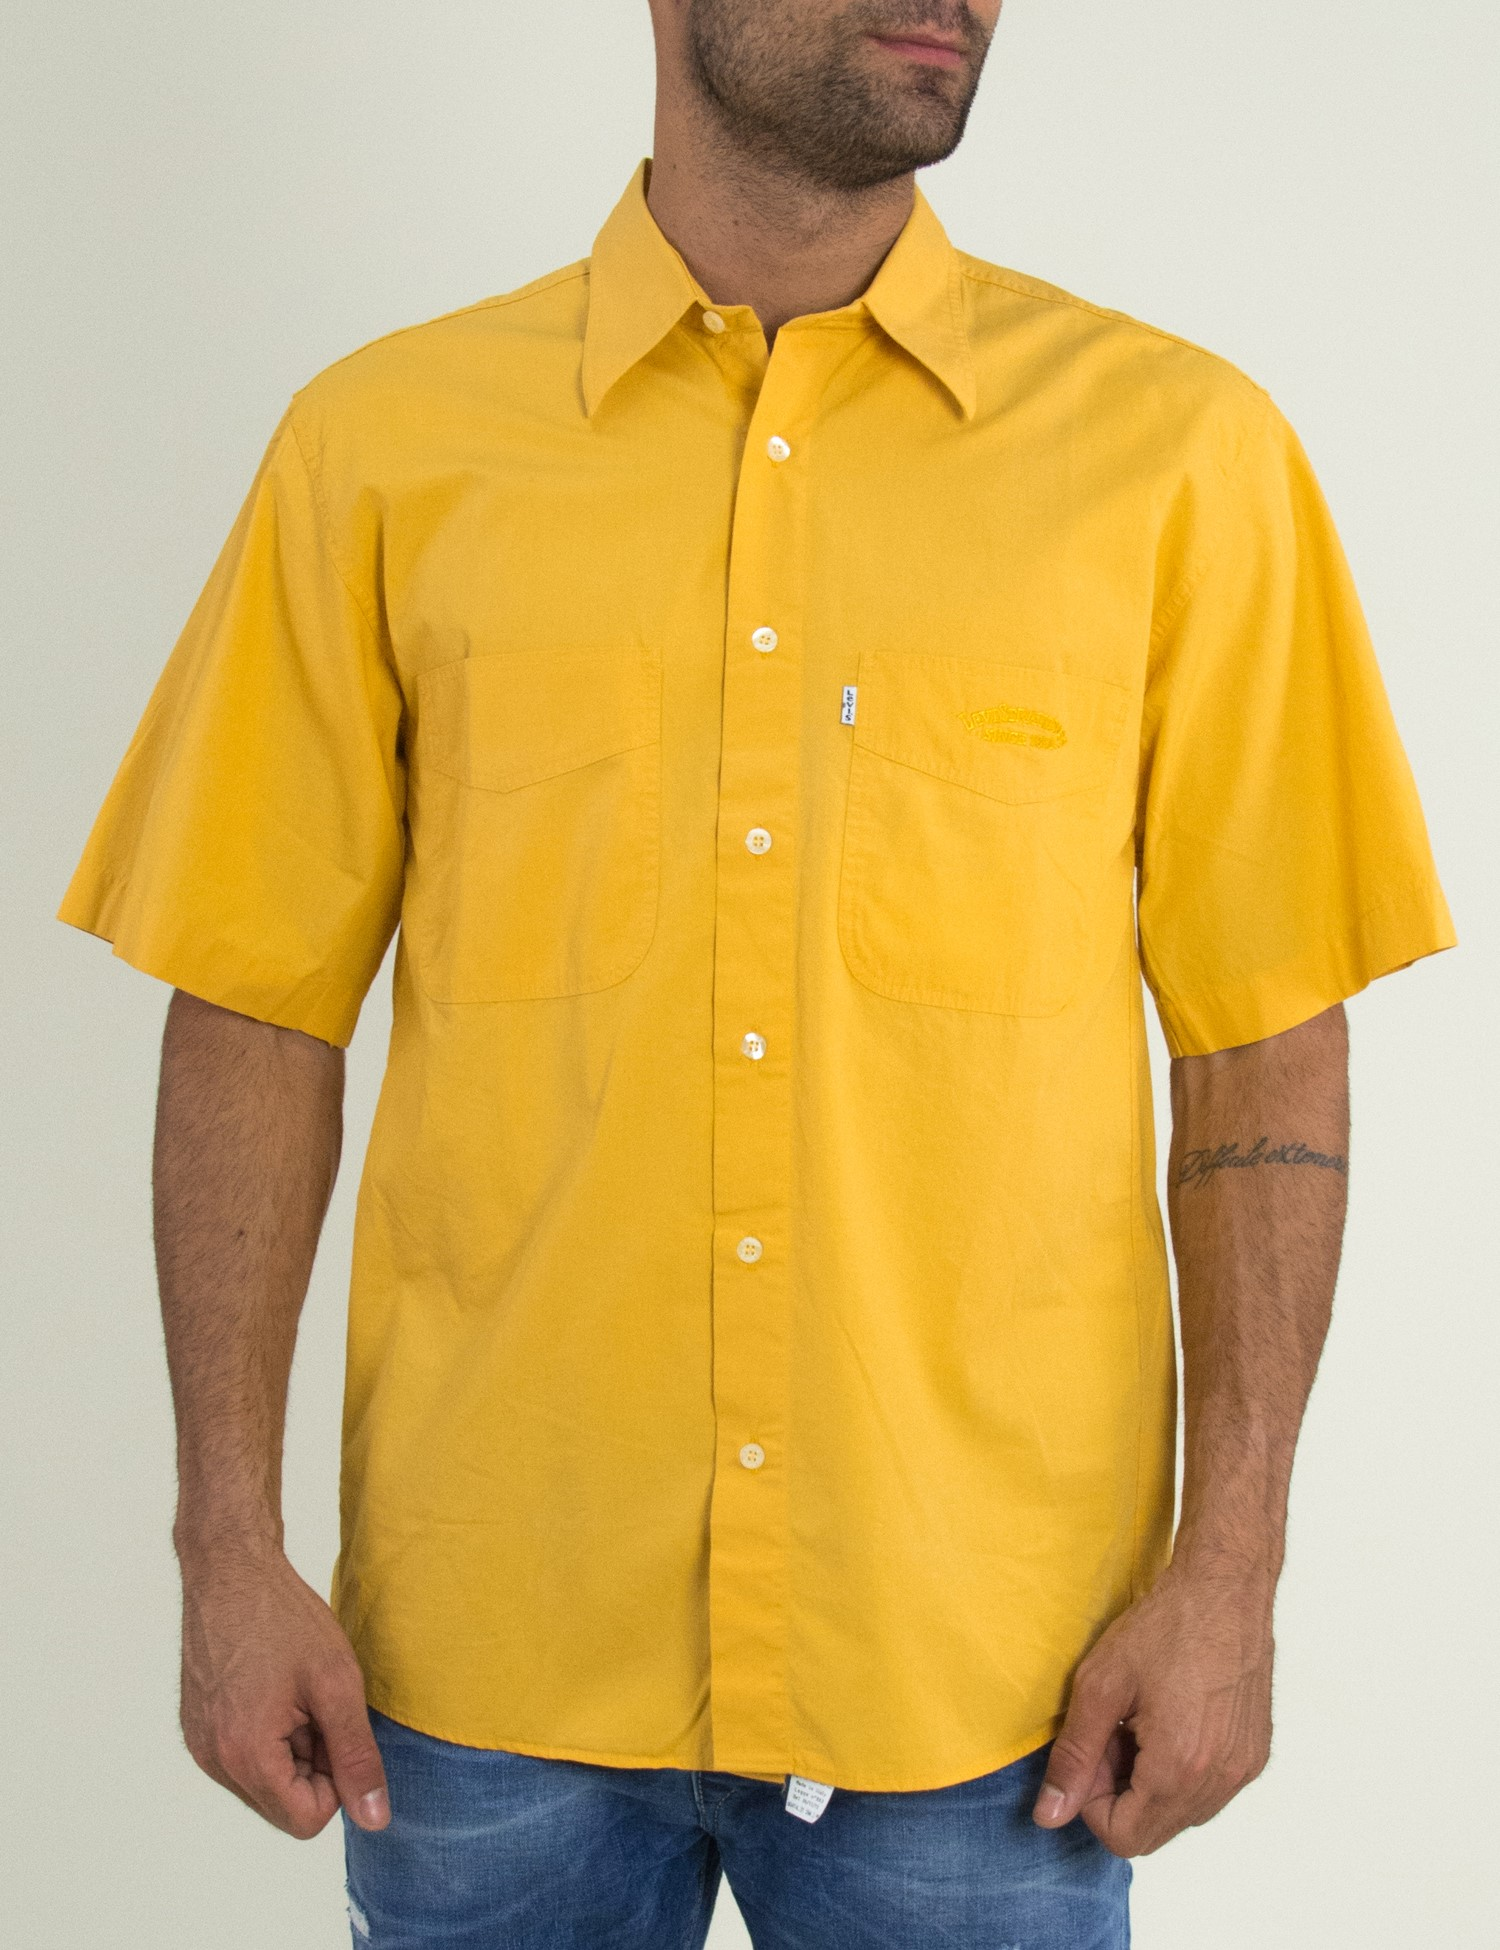 11e4550091b0 Ανδρικό κοντομάνικο πουκάμισο Levis κίτρινο 69356